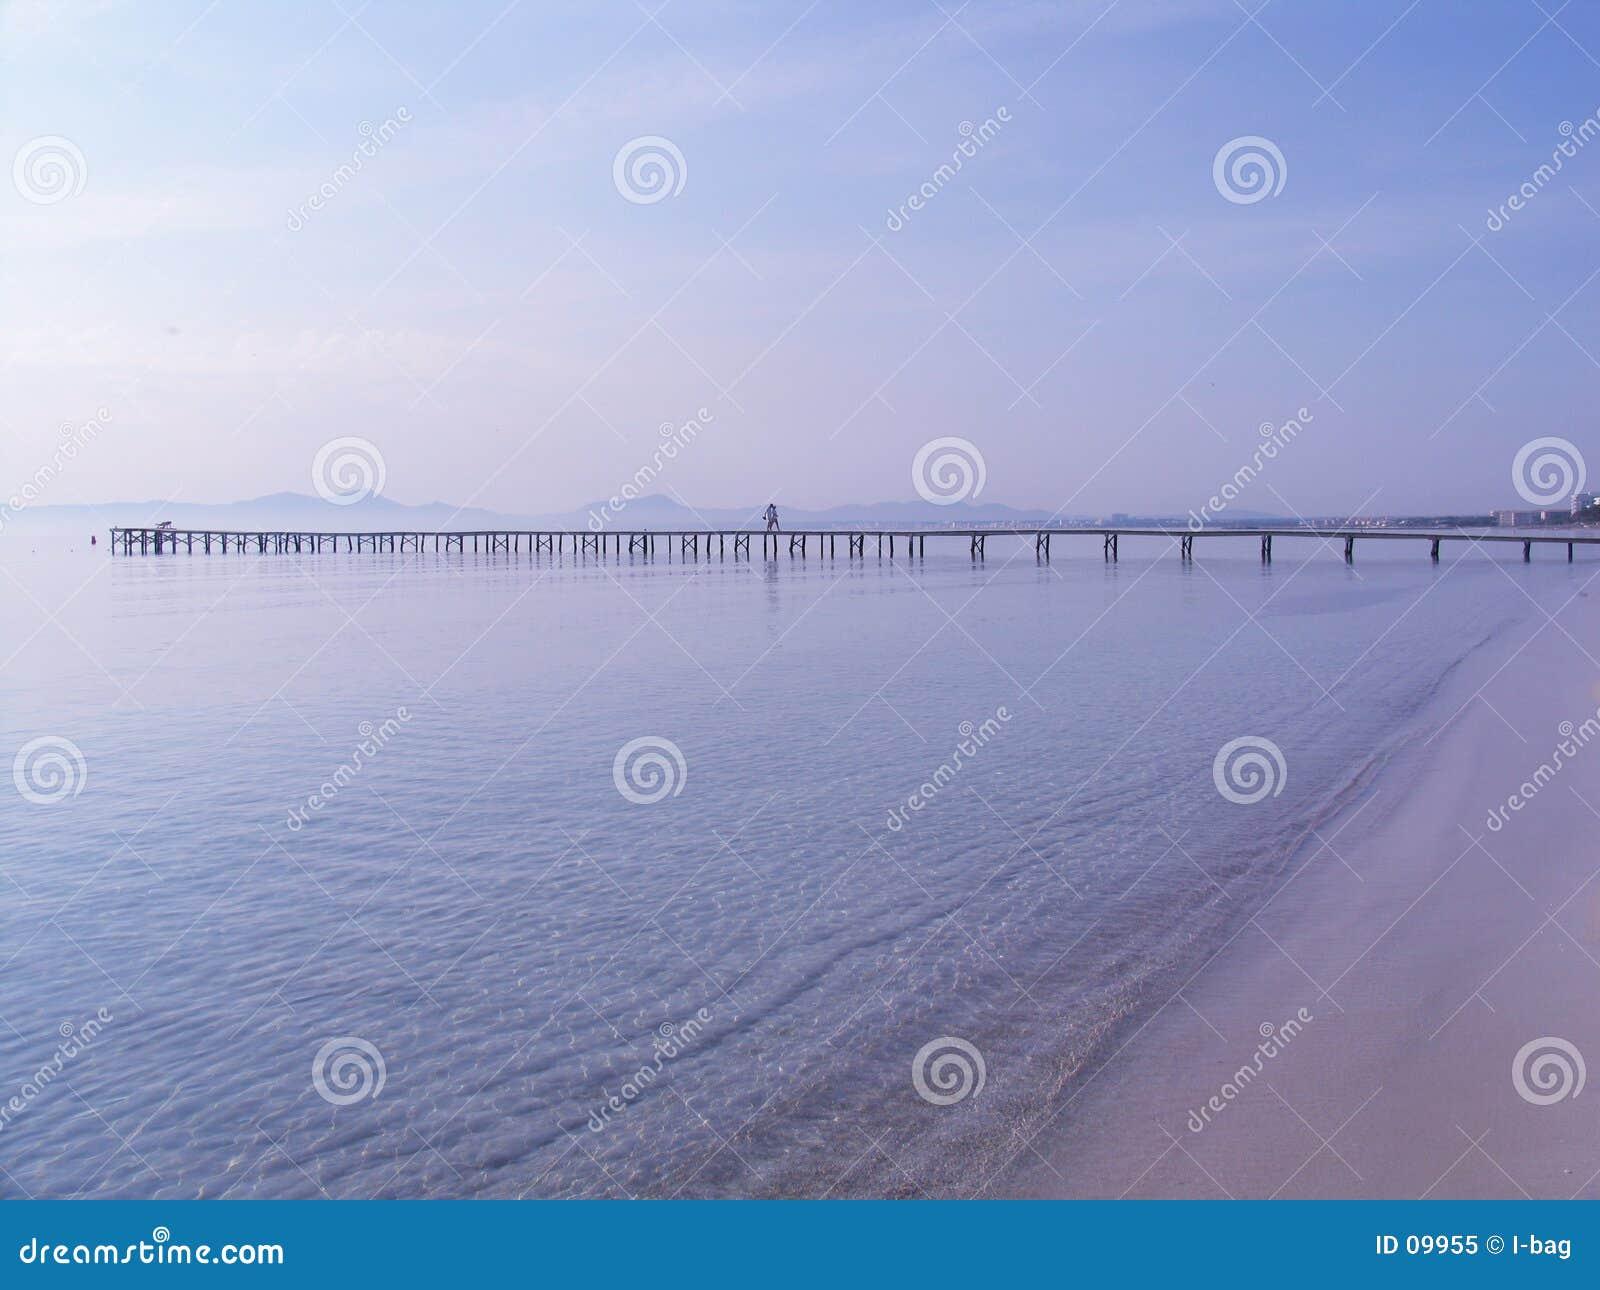 Pier at the ocean